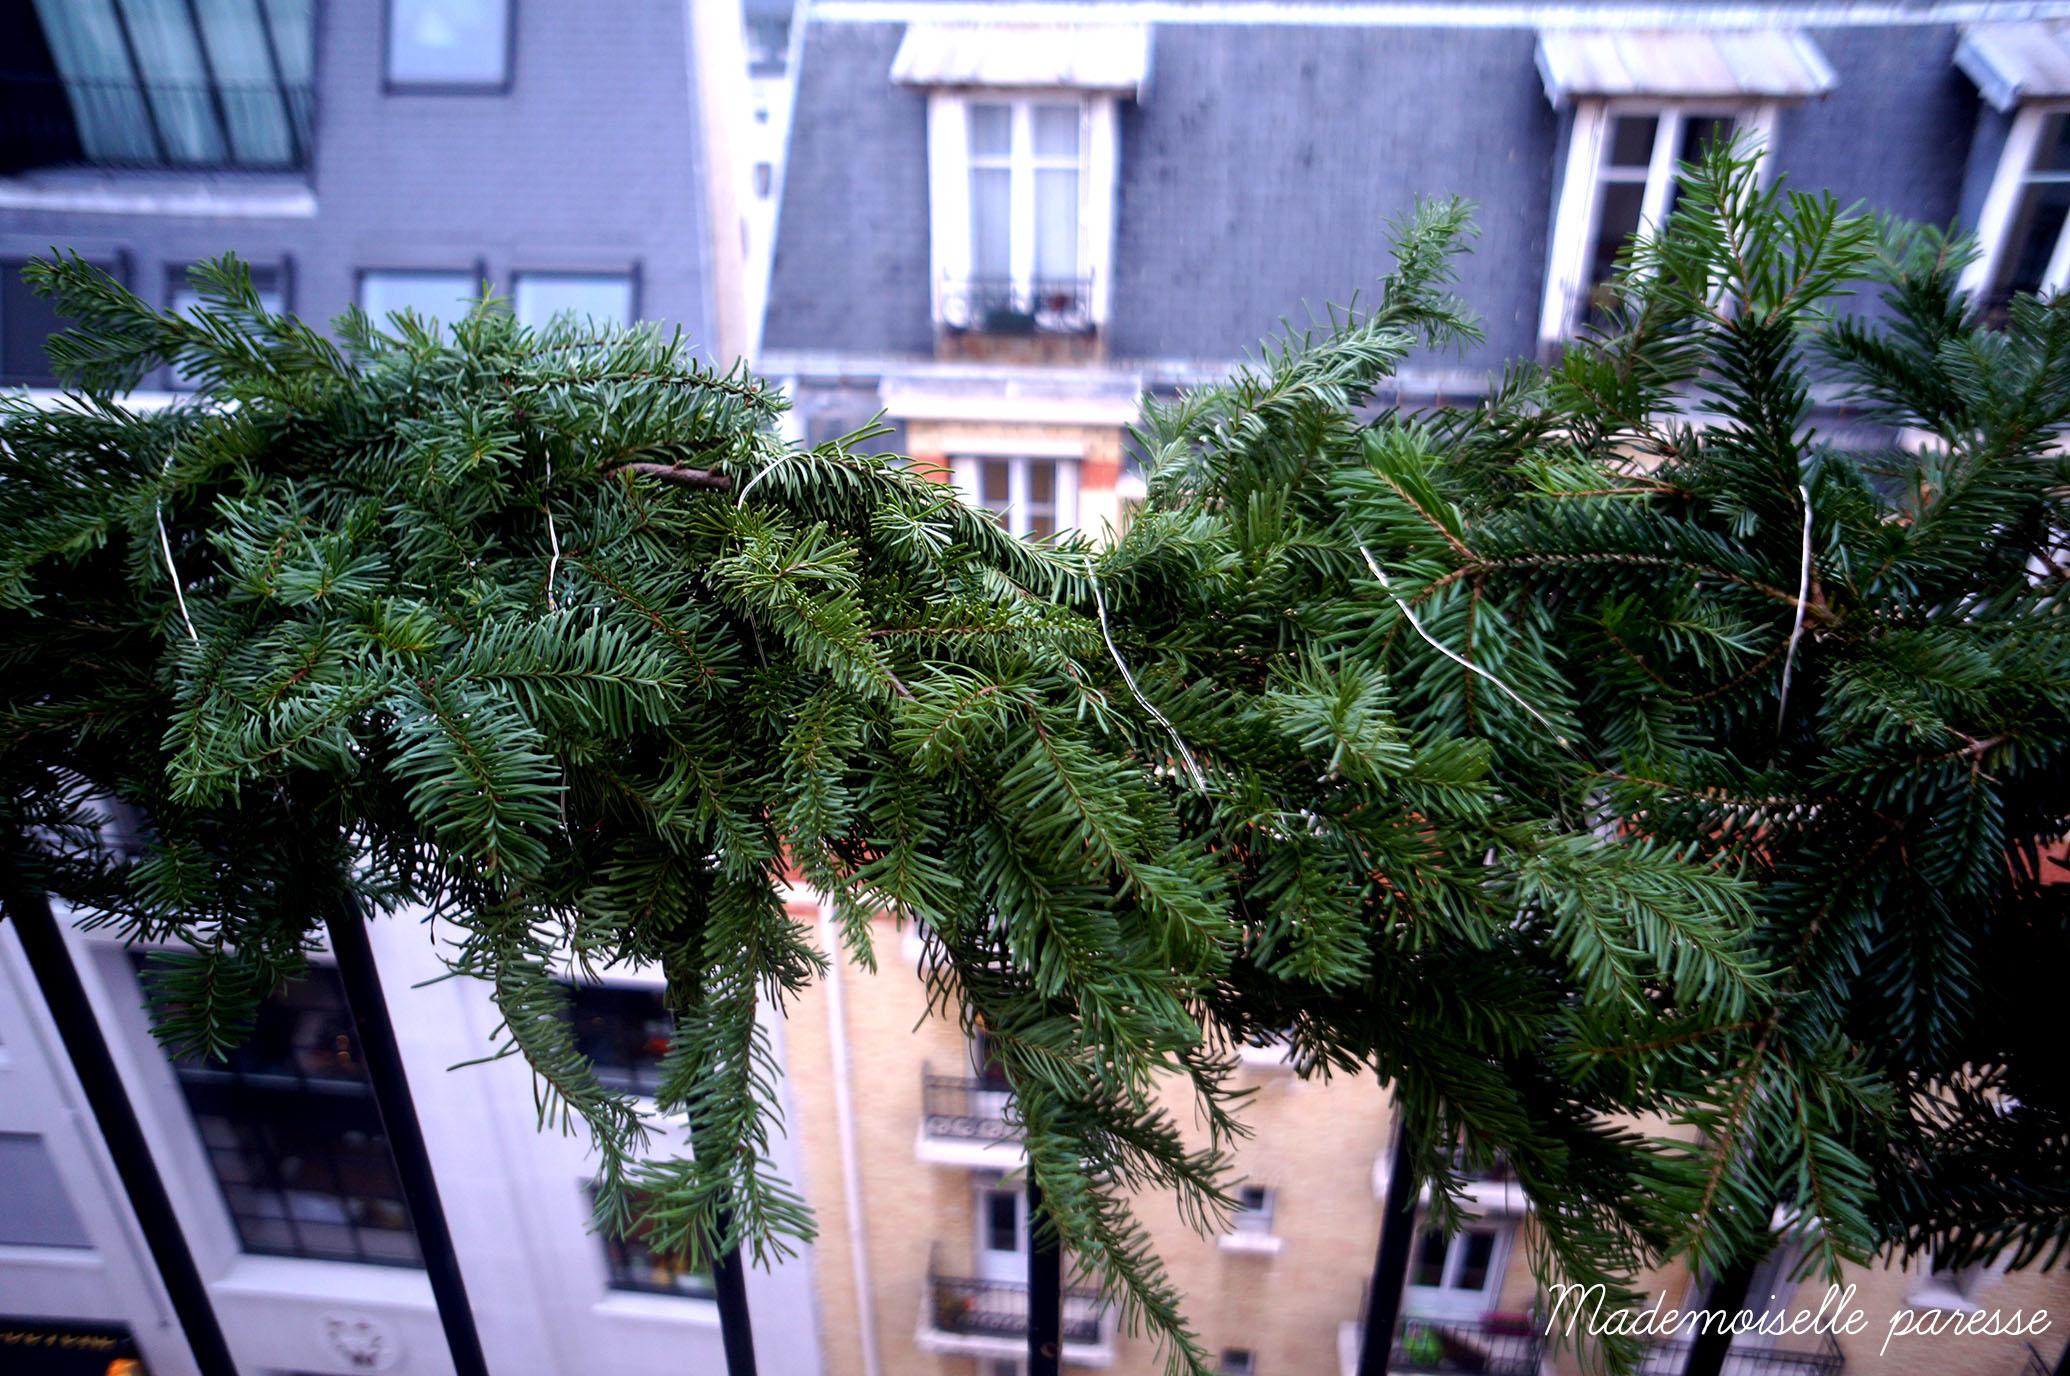 Decoration Balcon De Noel.Noel Au Balcon Mademoiselle Paresse